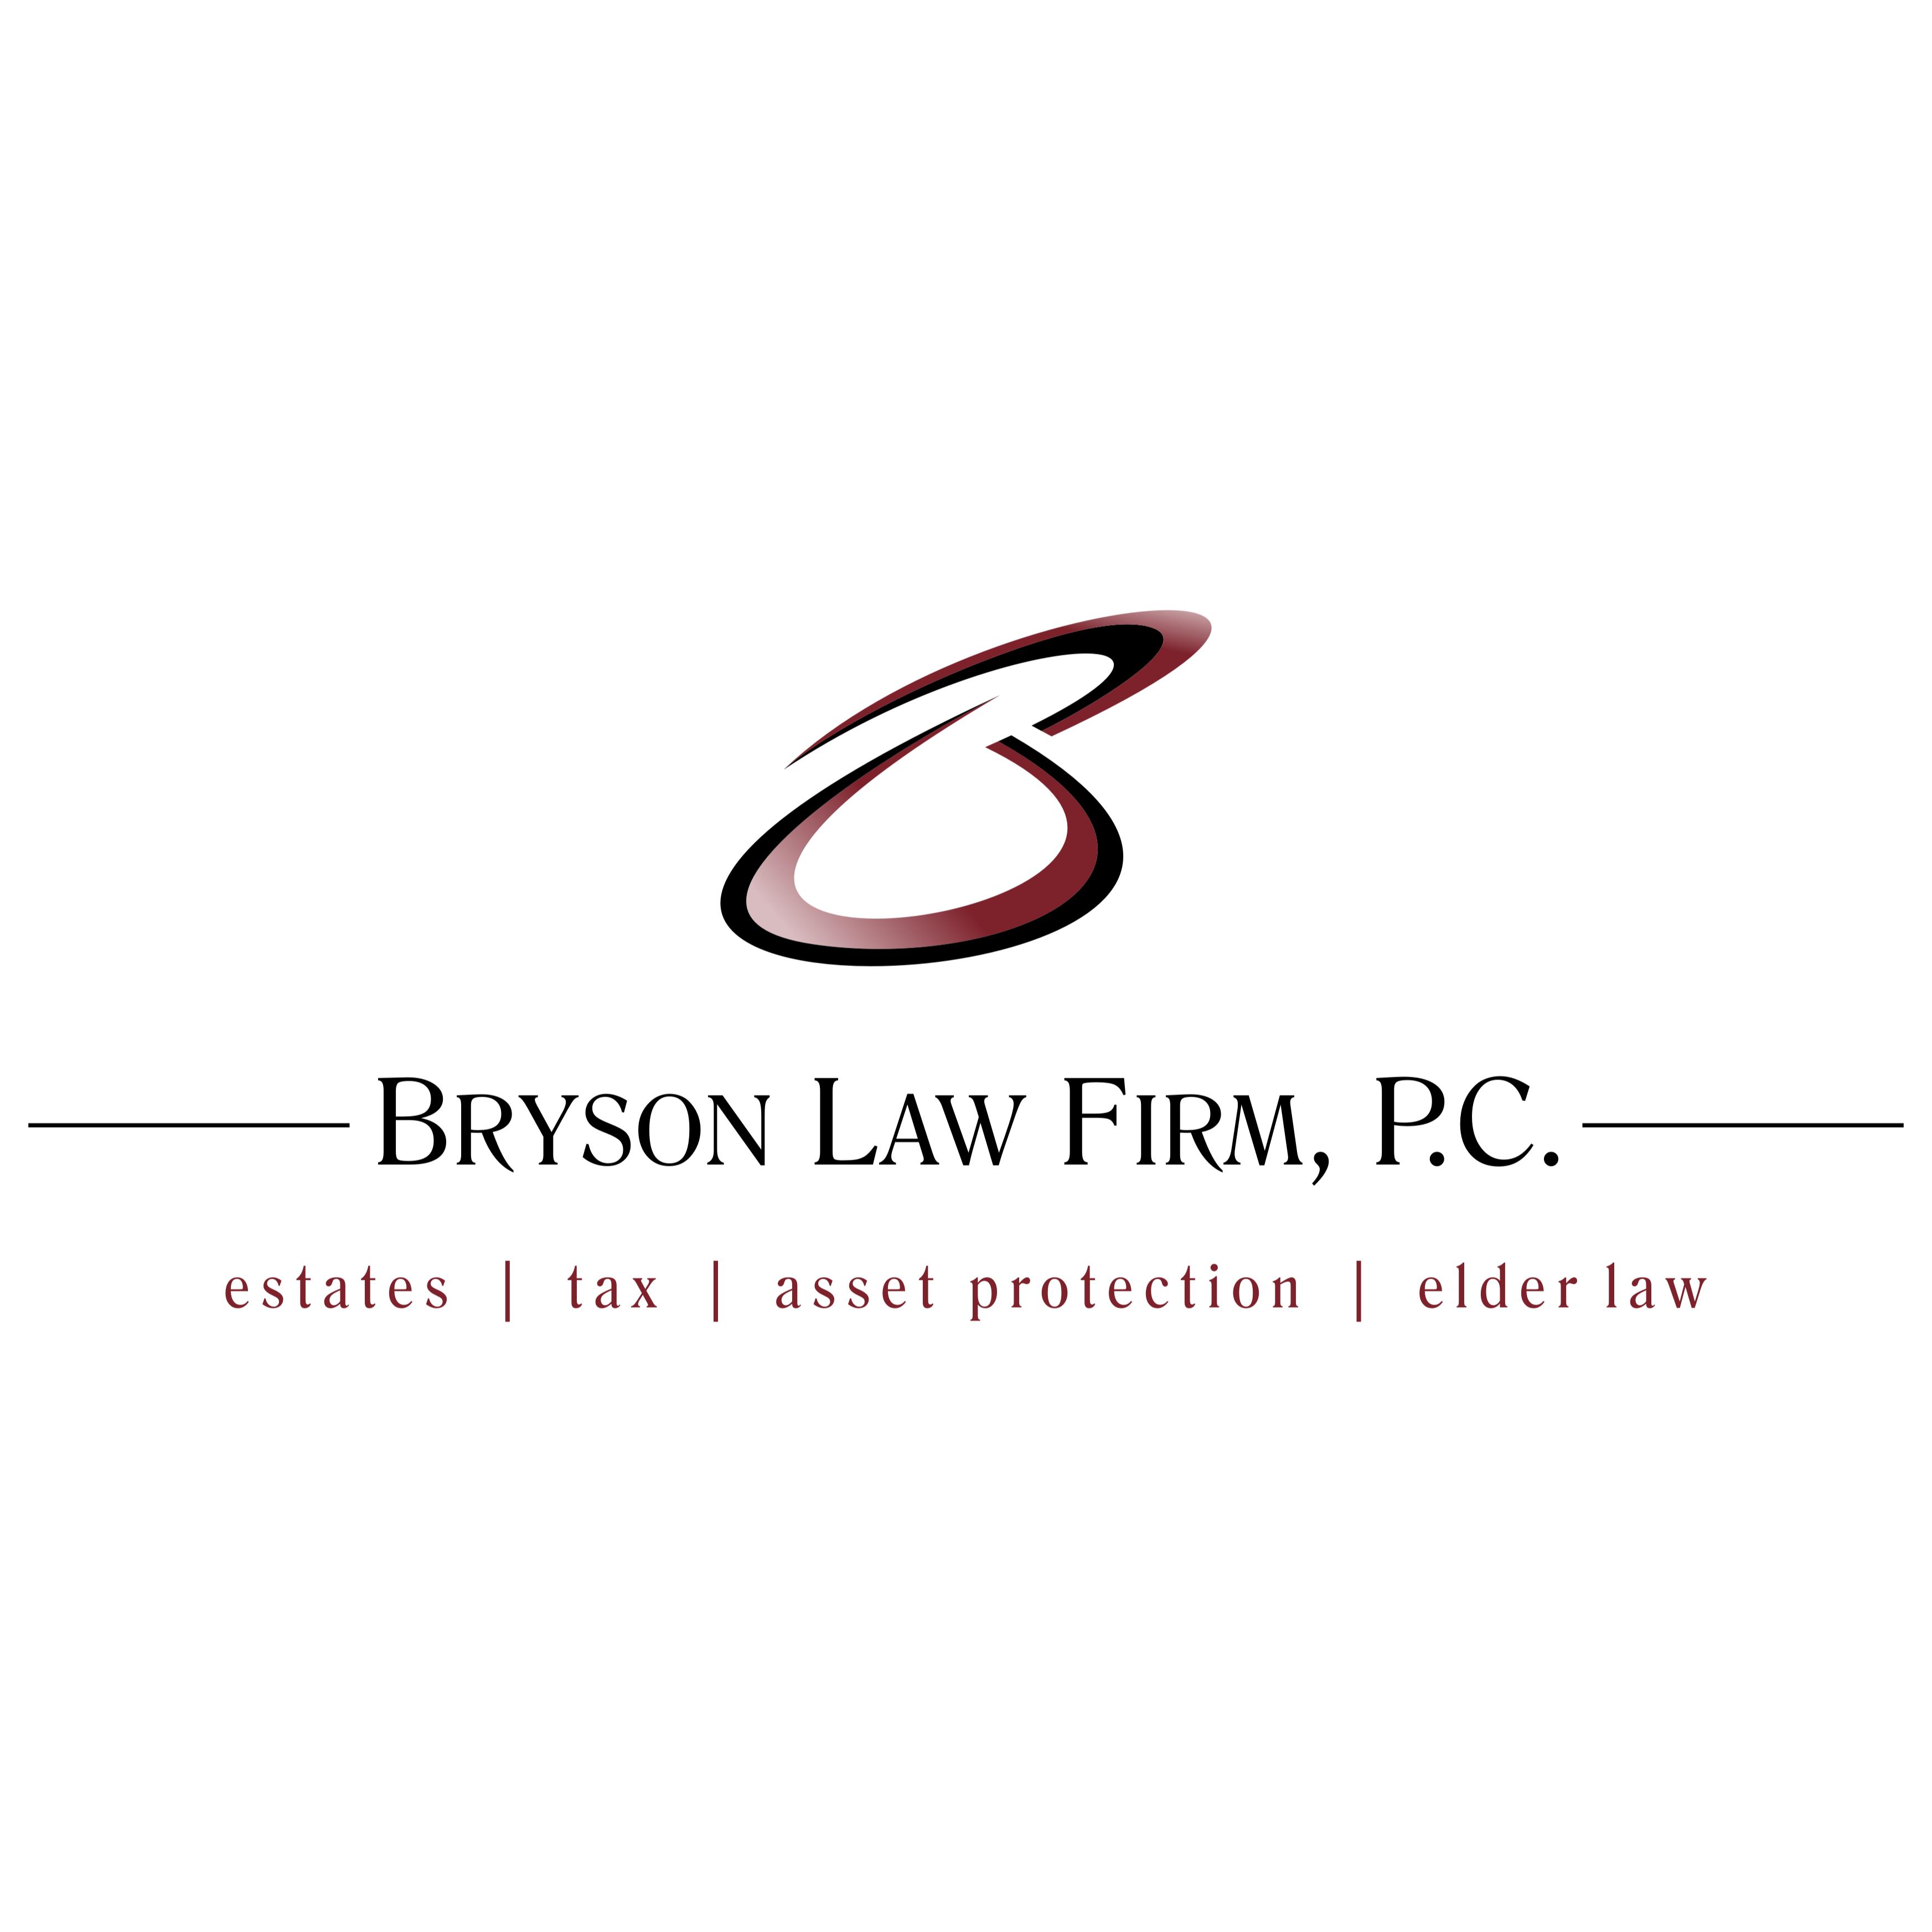 Bryson Law Firm, P.C. - Suwanee, GA 30024 - (404)909-8842   ShowMeLocal.com